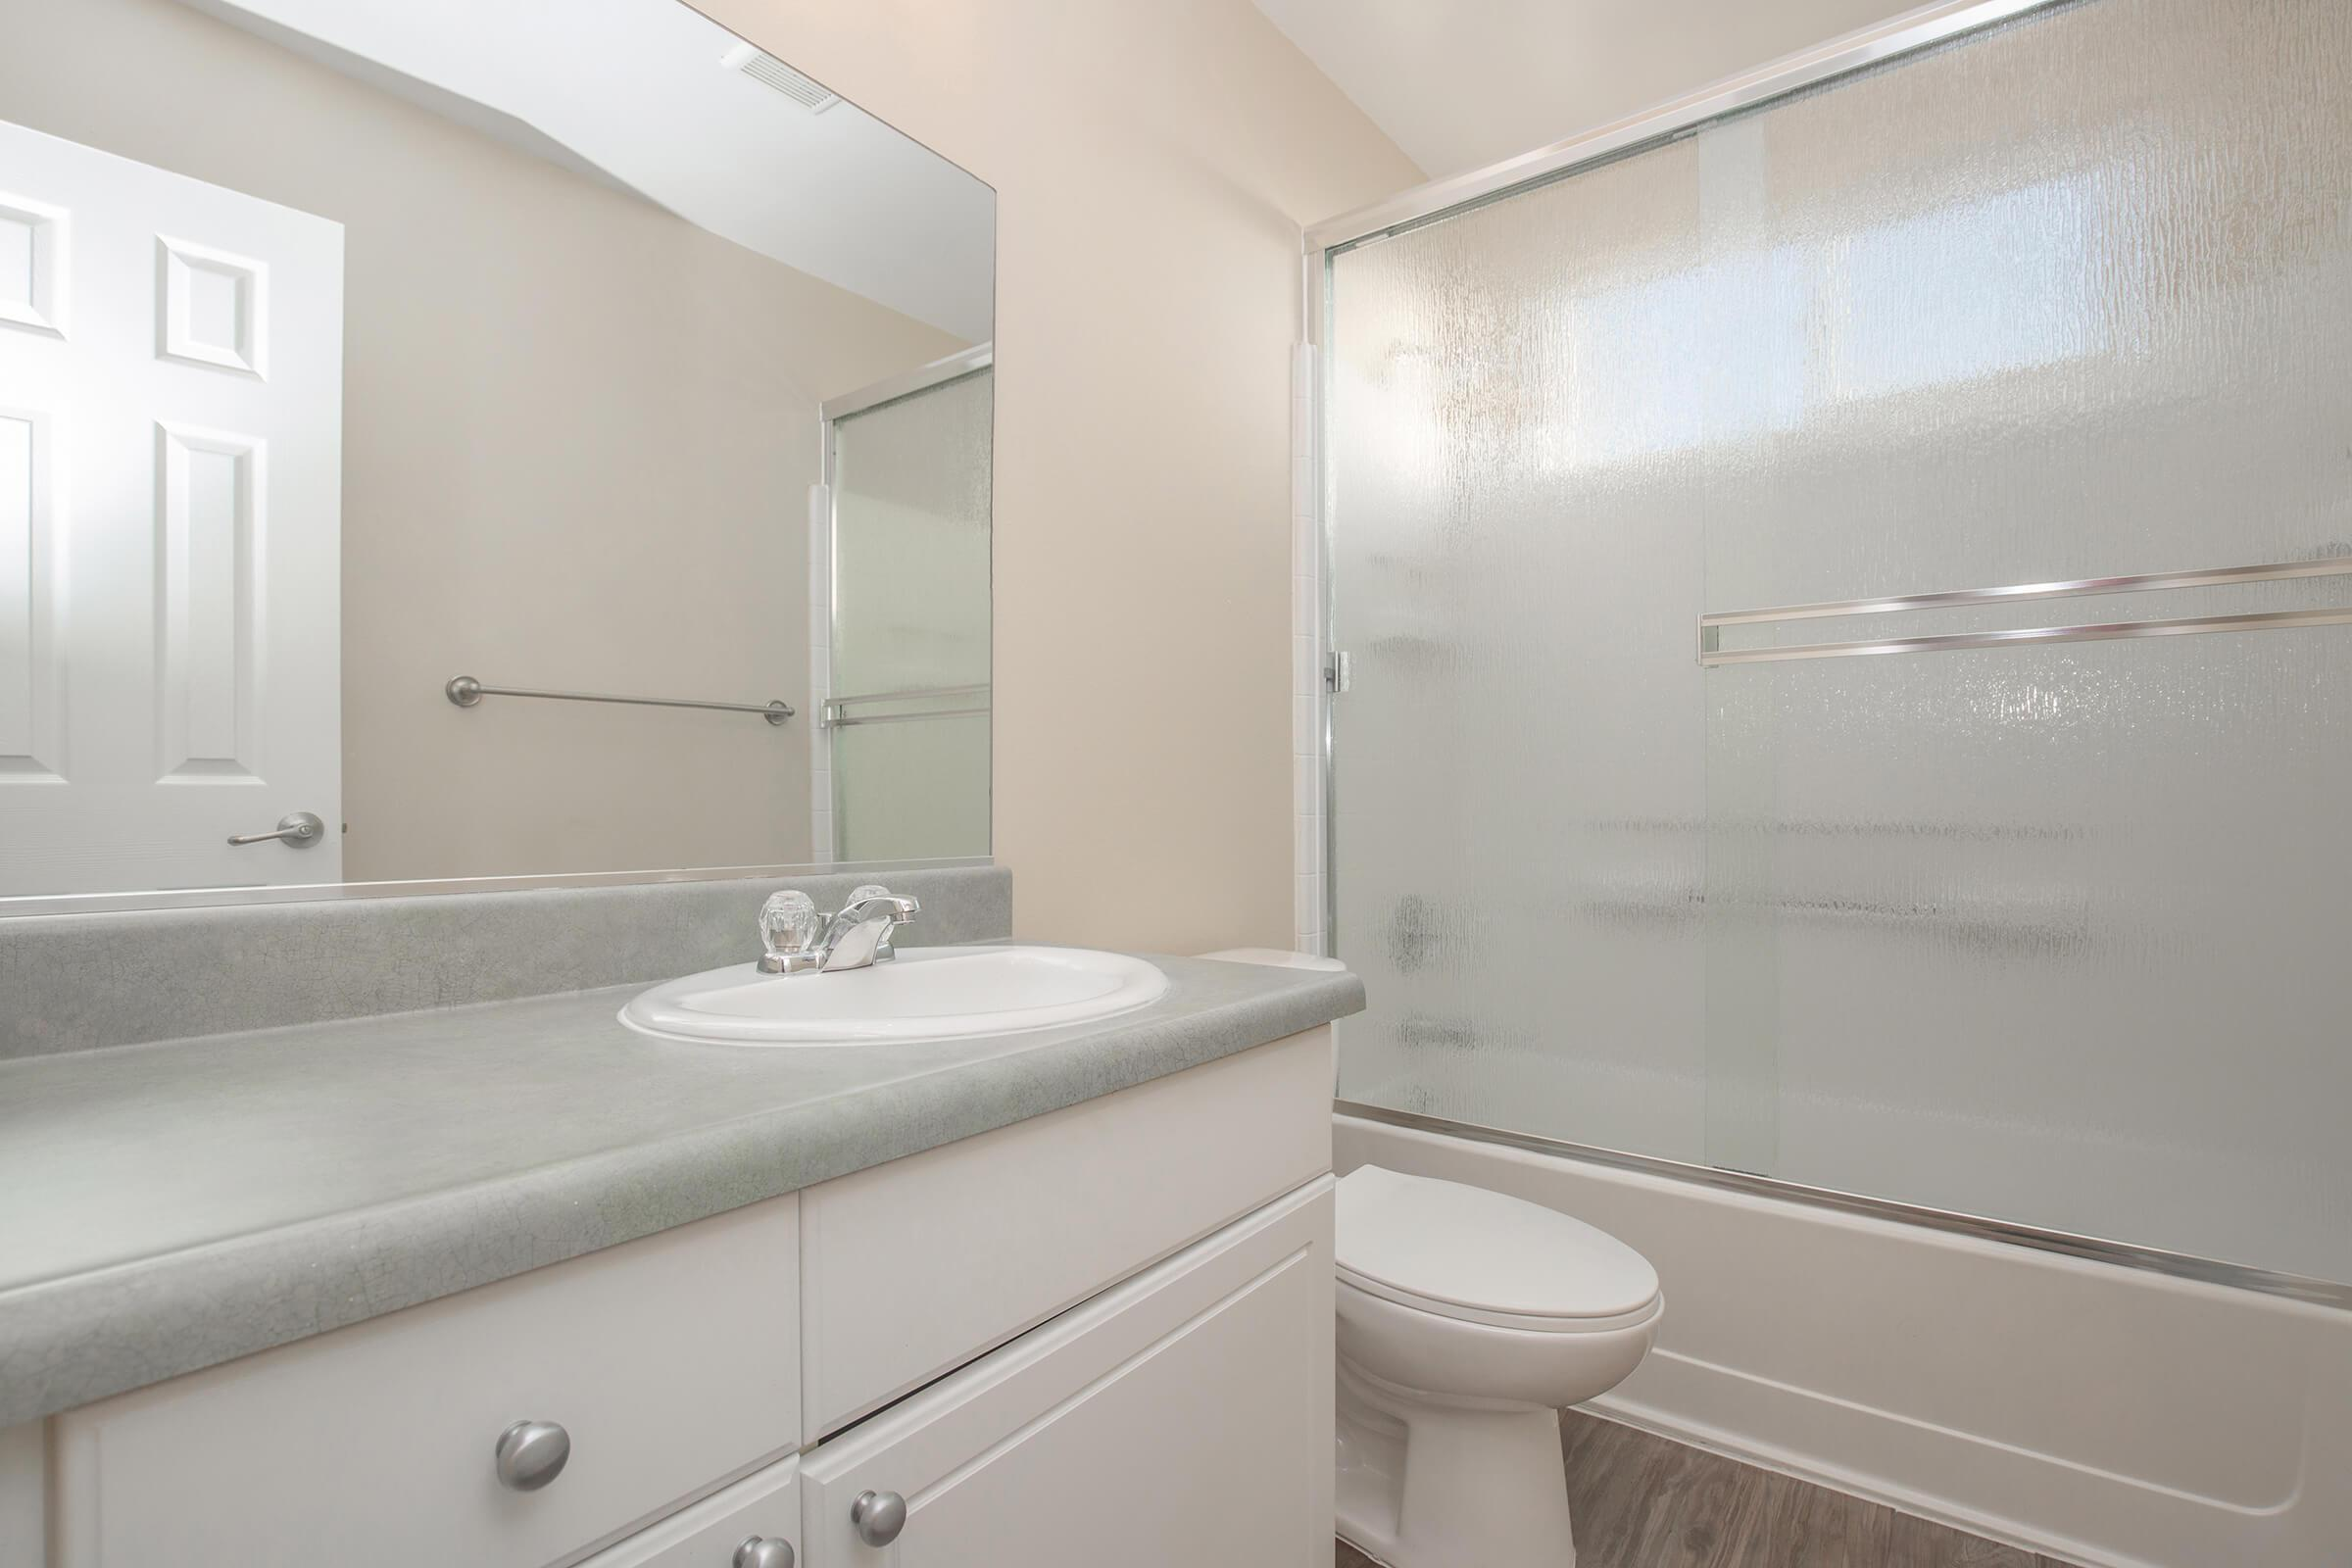 Bathroom with glass sliding doors